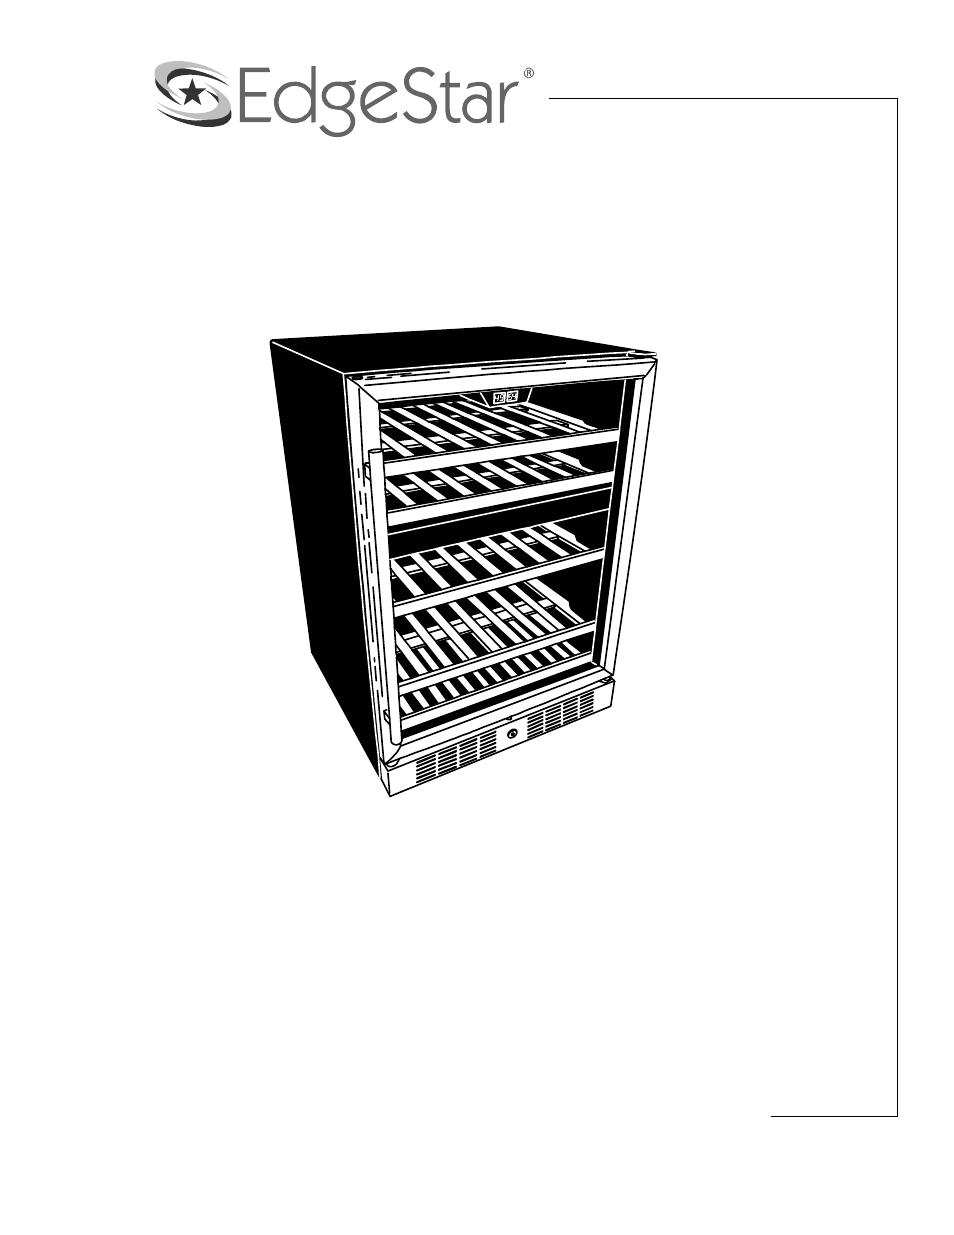 edgestar cwr460dz user manual 17 pages rh manualsdir com EdgeStar Kegerator EdgeStar Kegerator